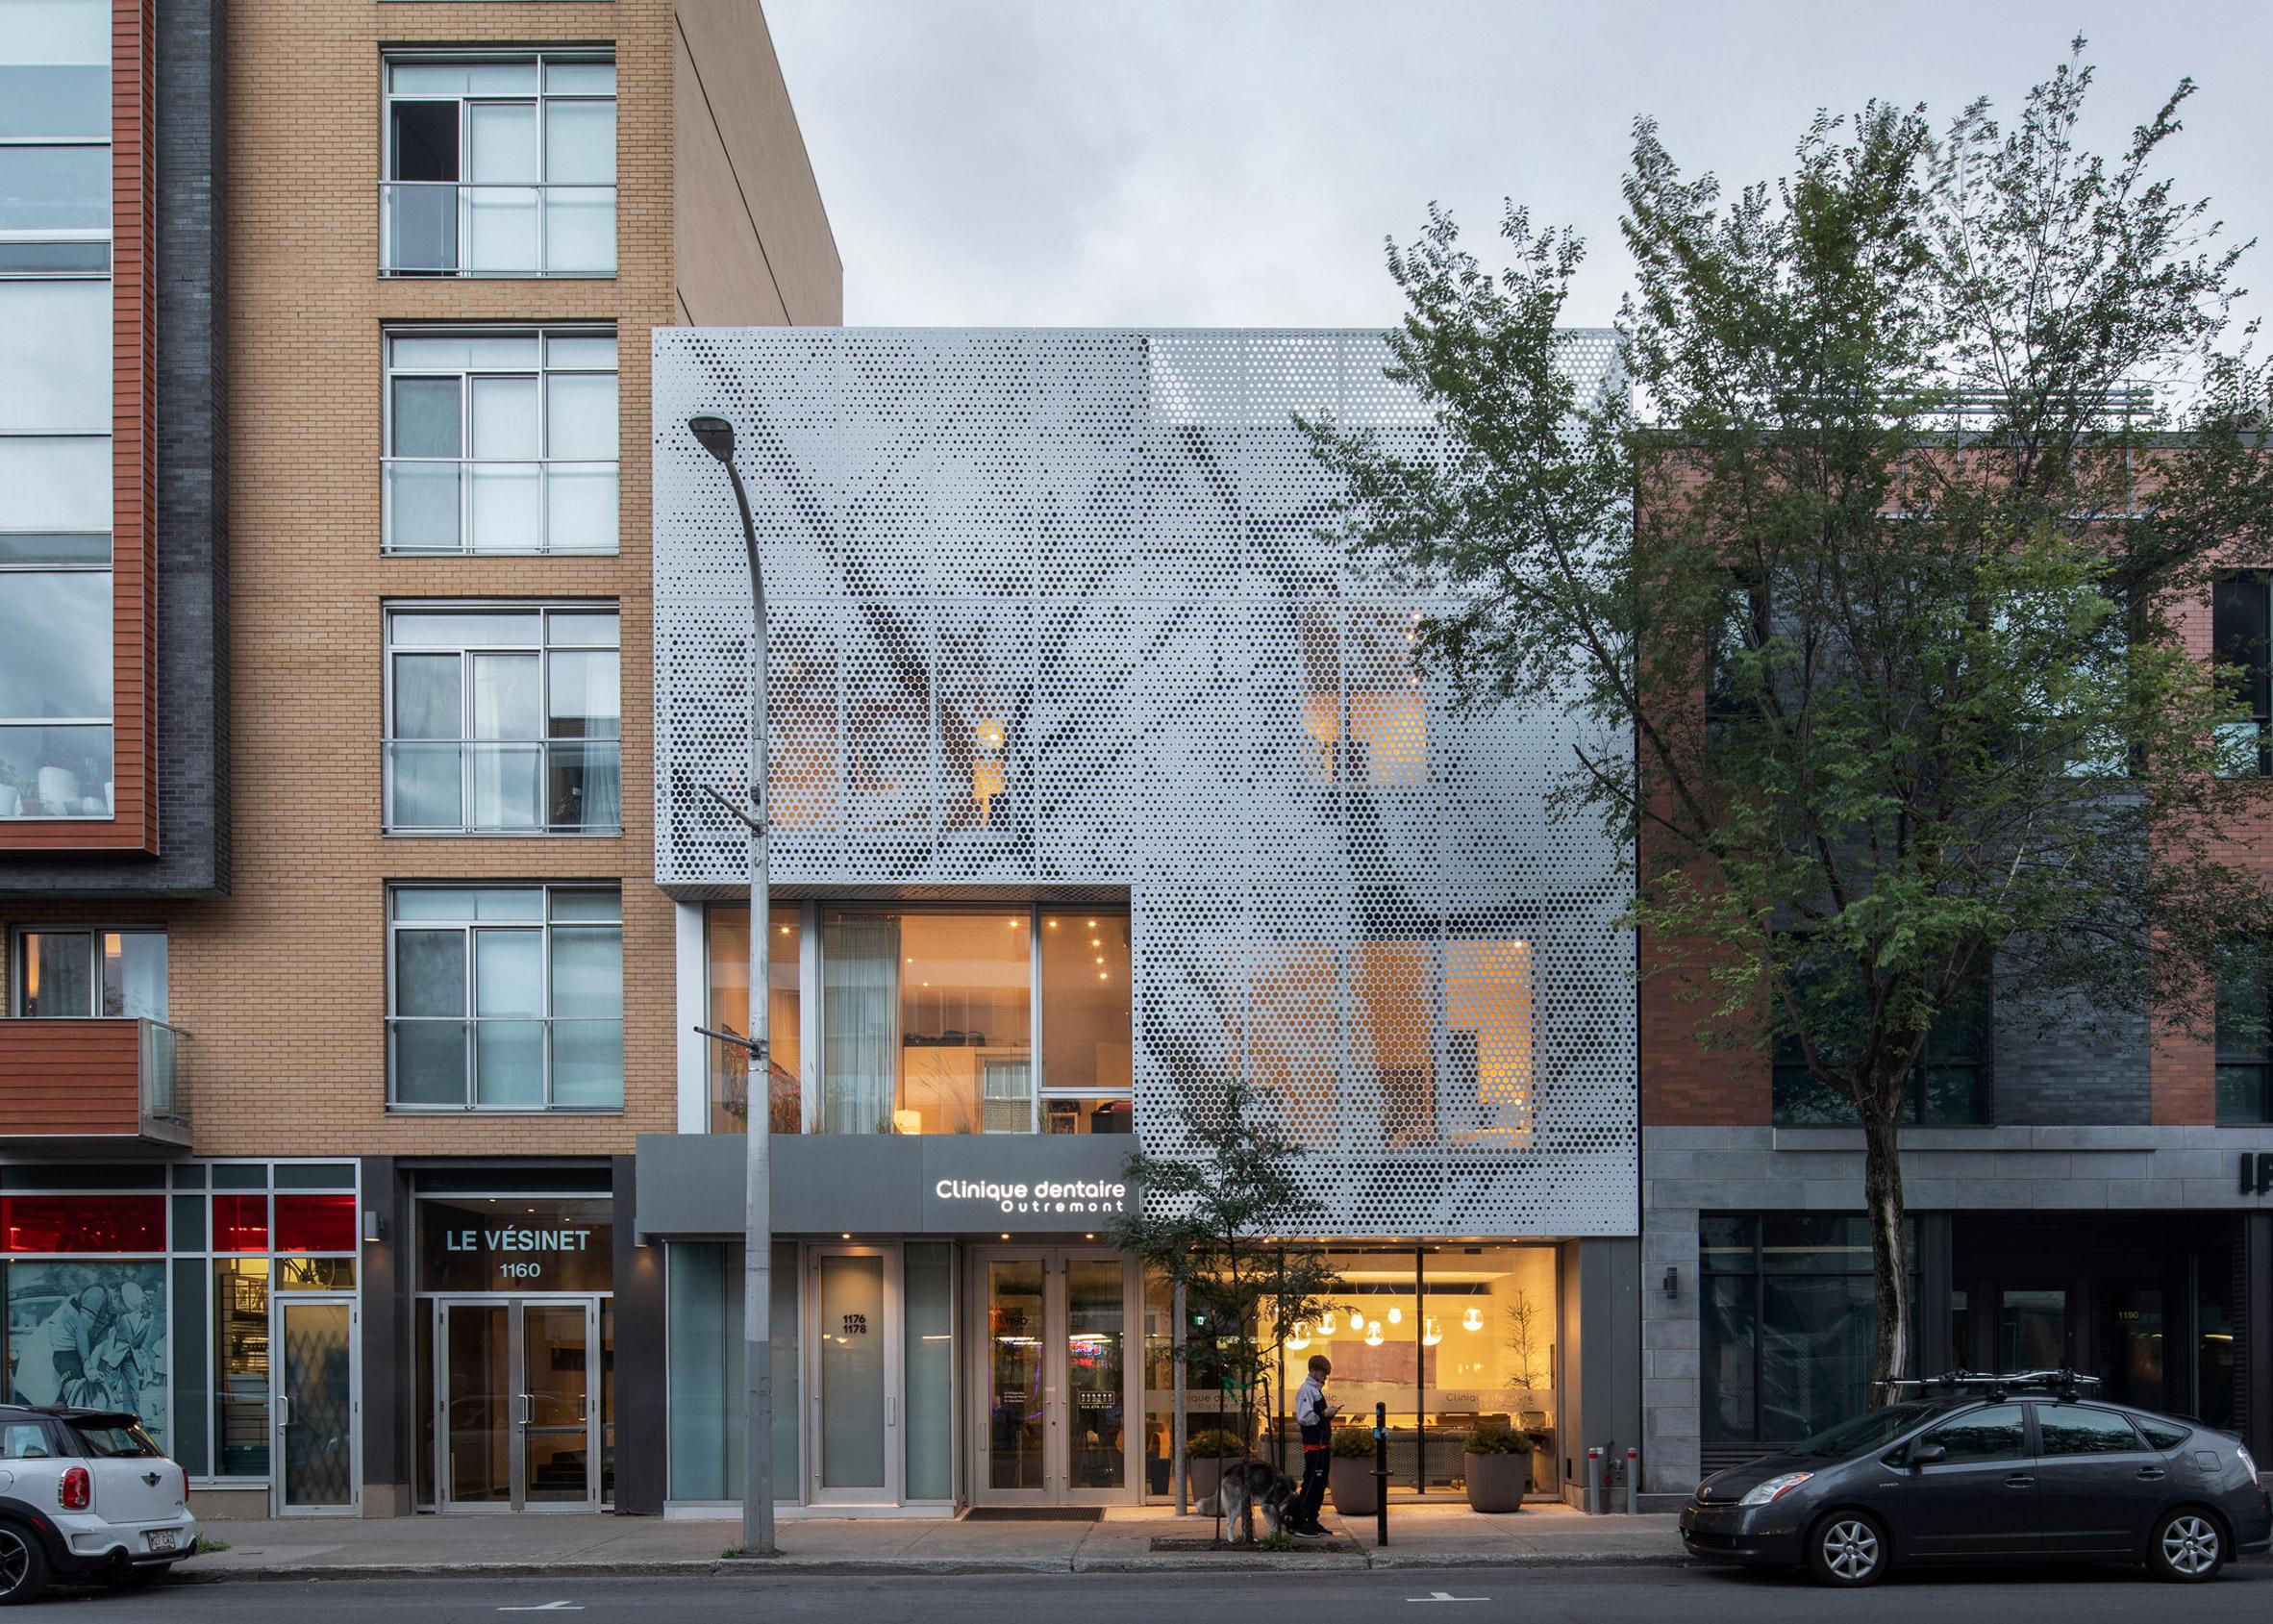 Modern loft-style apartments built atop a dentist's office